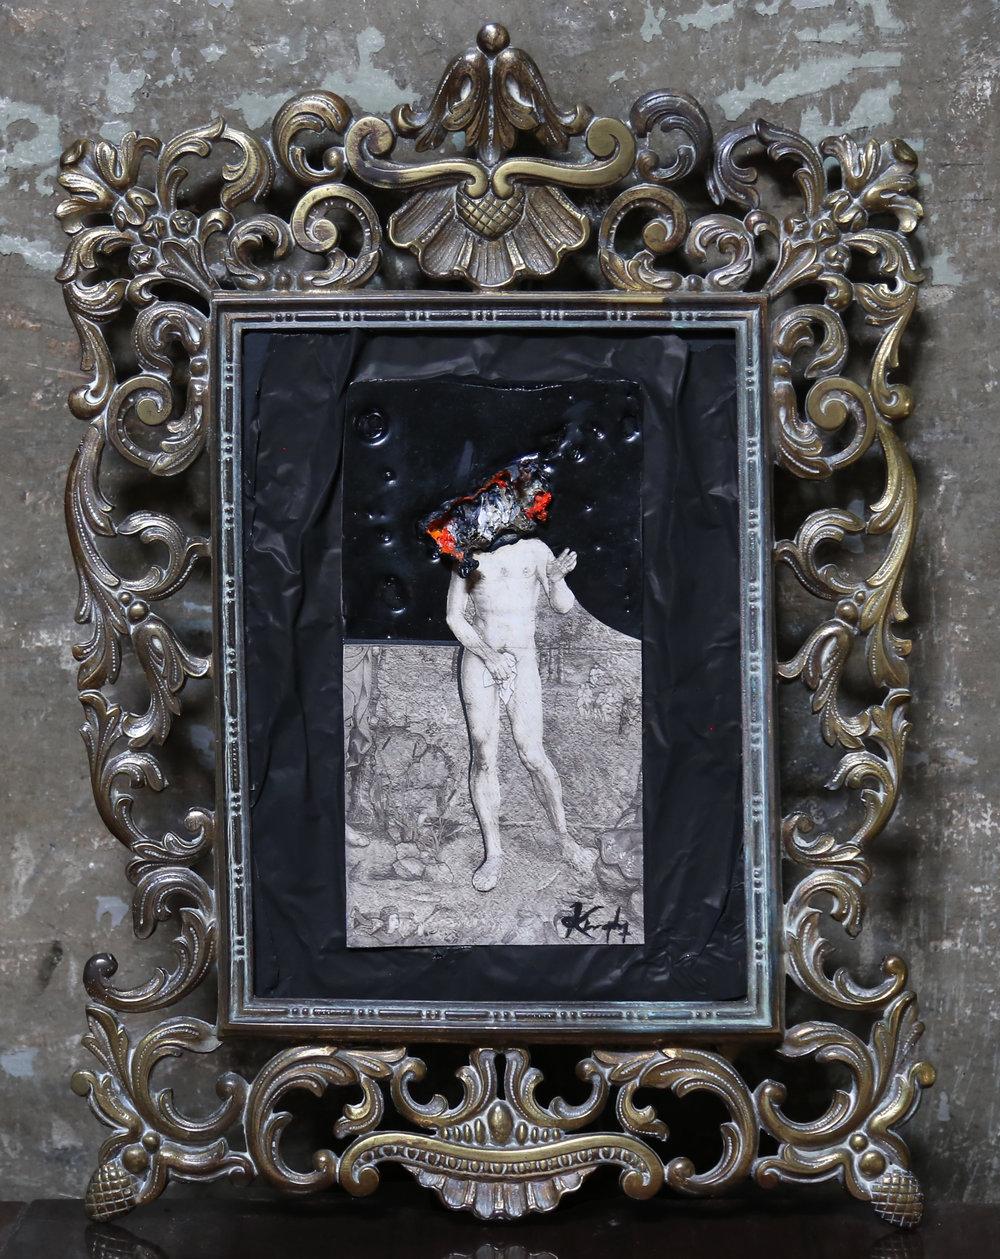 Solicitude - Oil, Paper, Tin & Antique Frame 28cm x 36cm